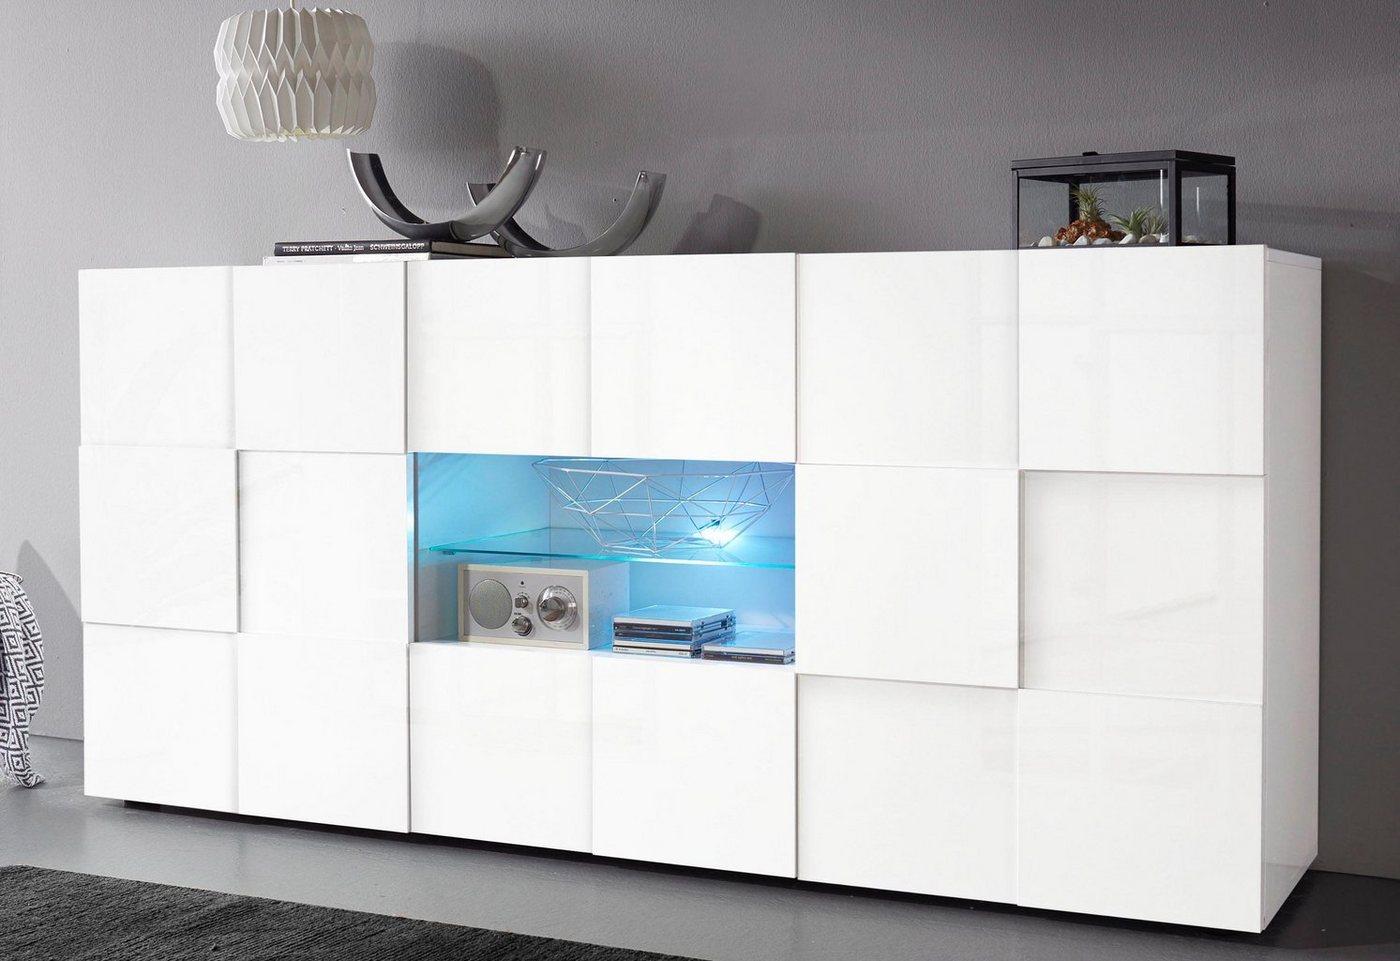 LC dressoir Dama, breedte 181 cm